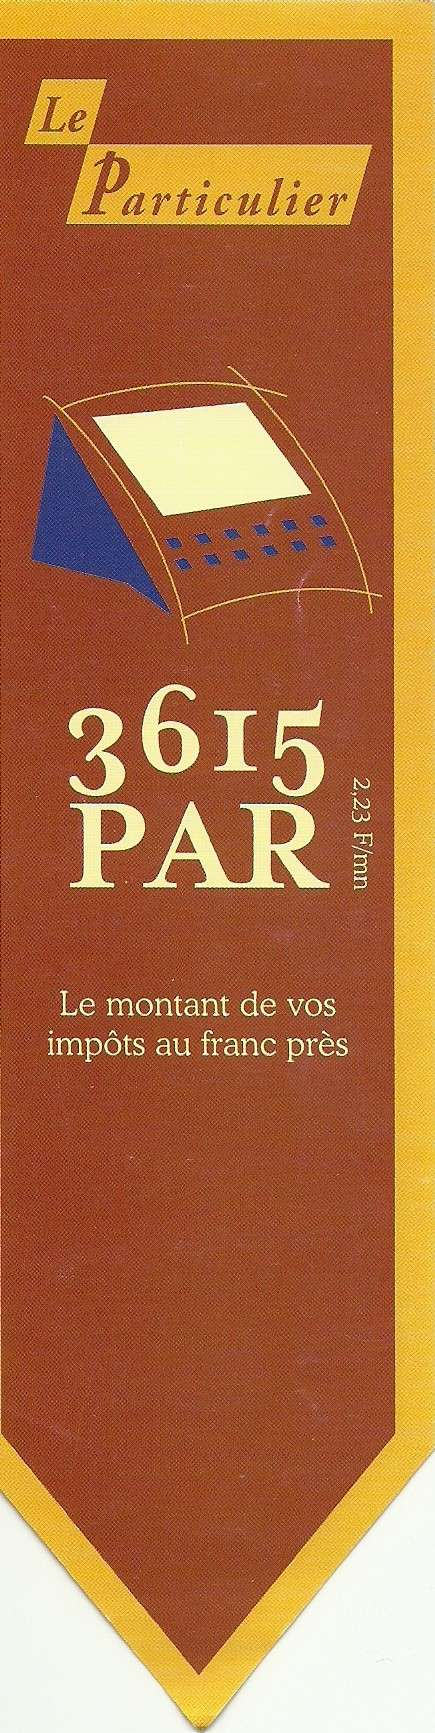 Doubles d'Alain Numari96